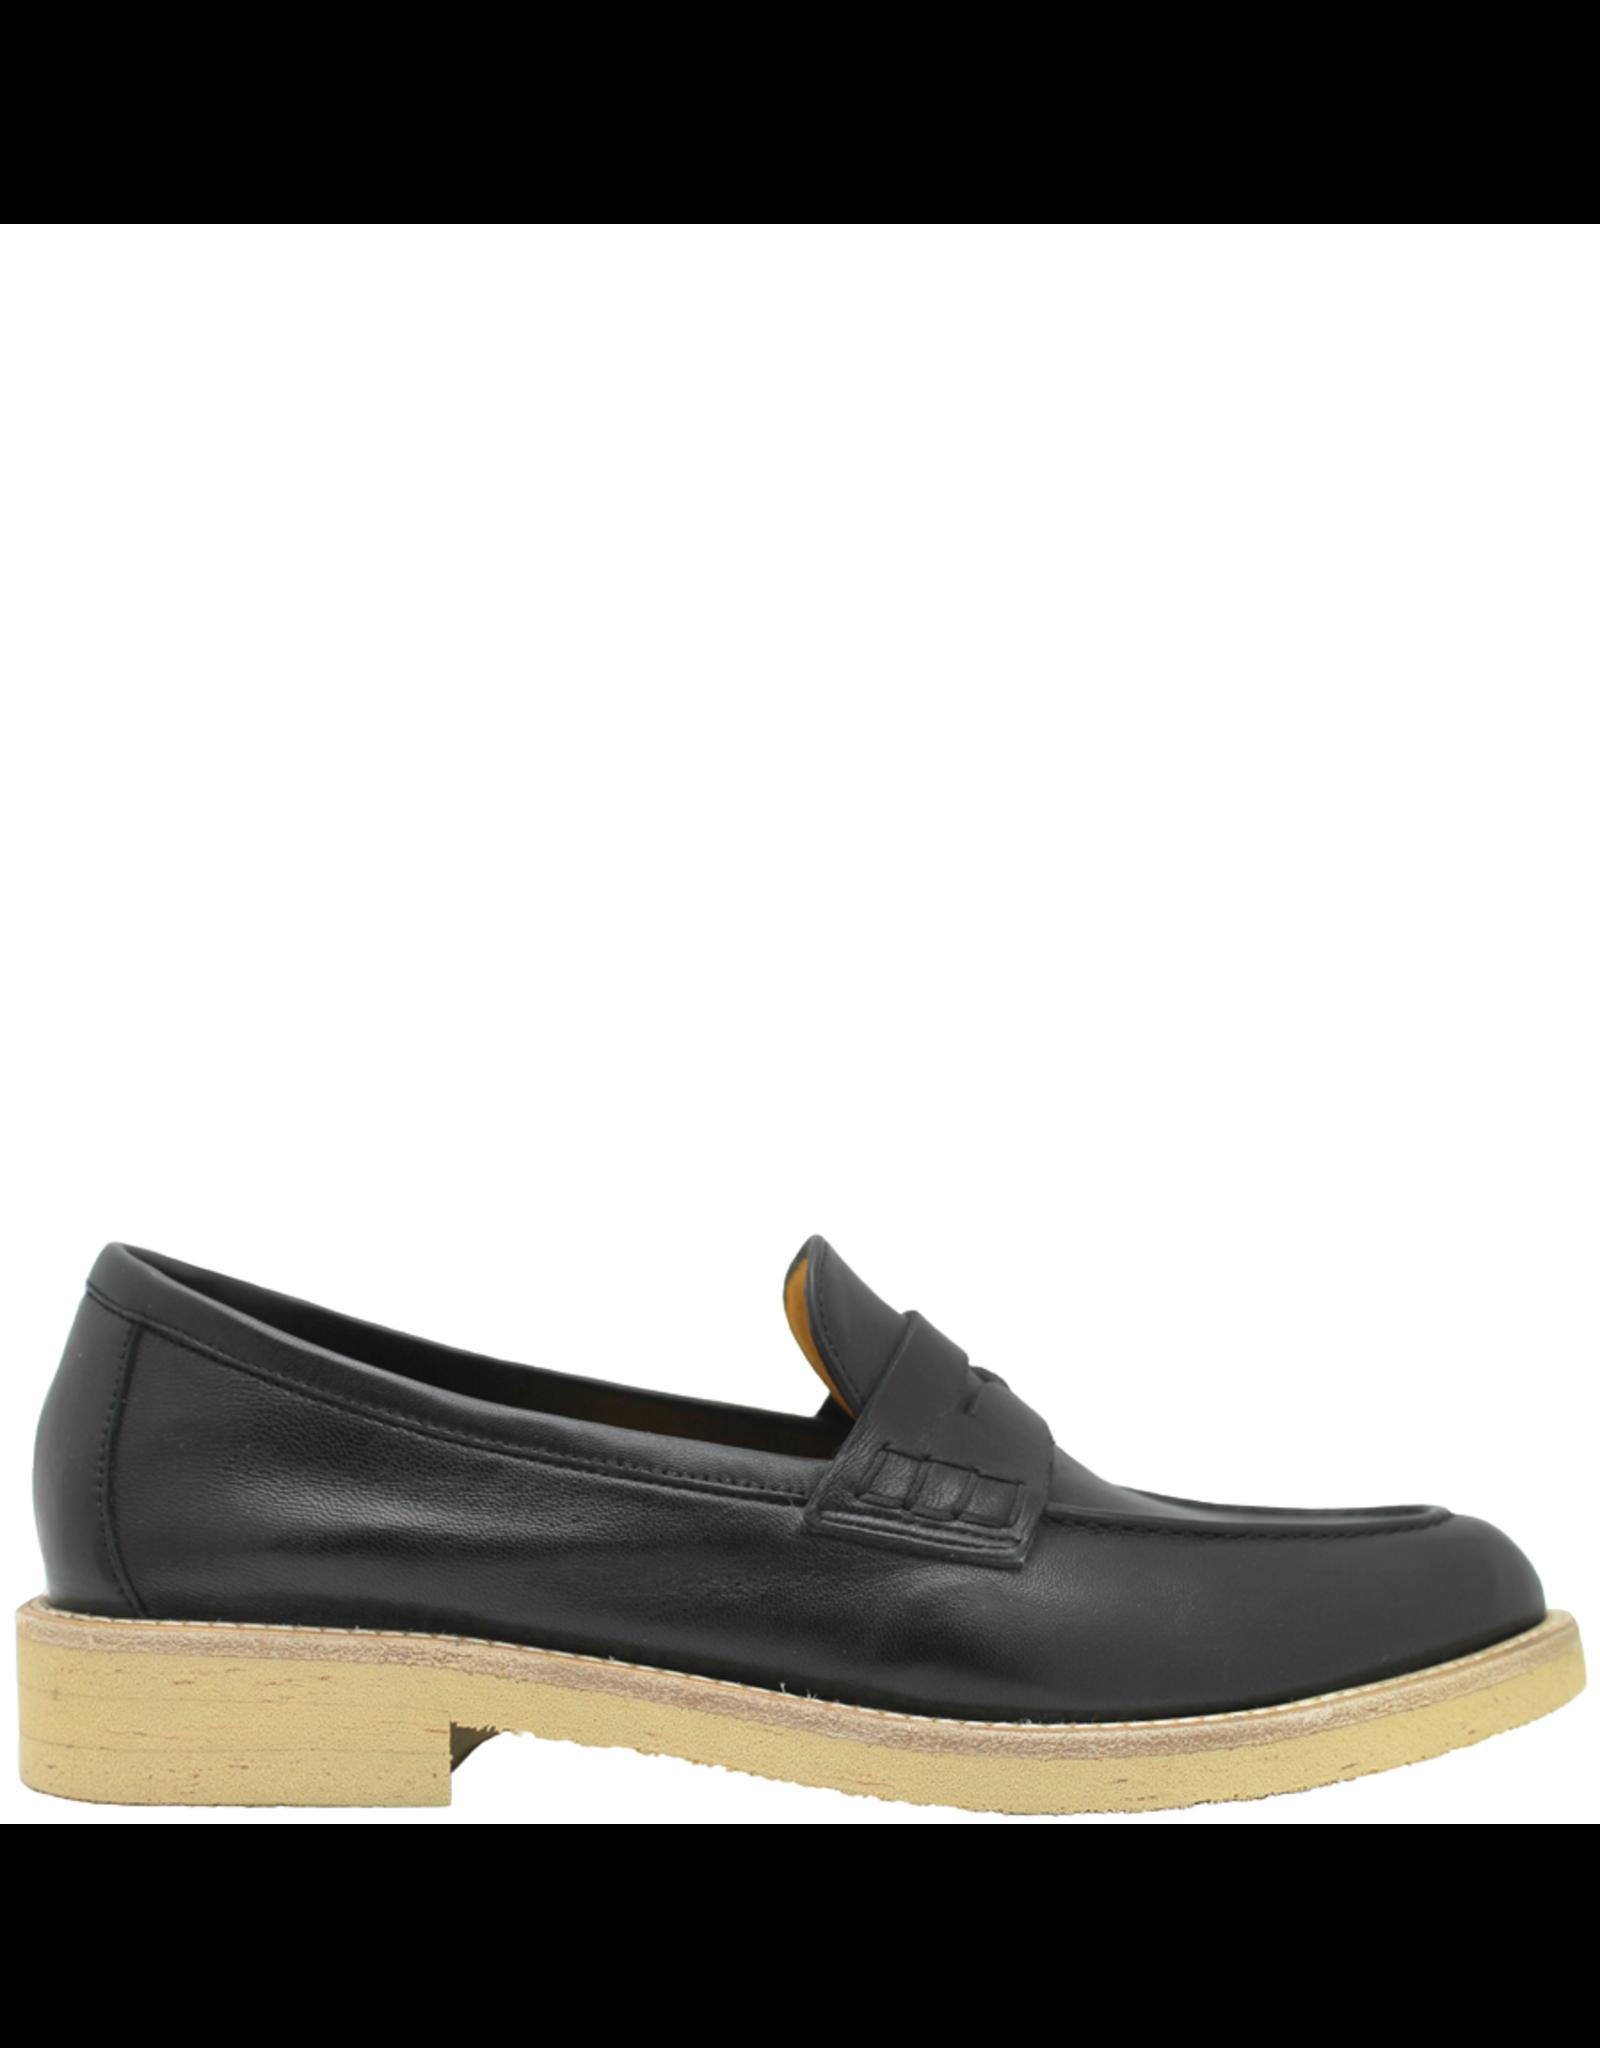 MaraBini MaraBini Black Nappa Light Sole Loafer 8116